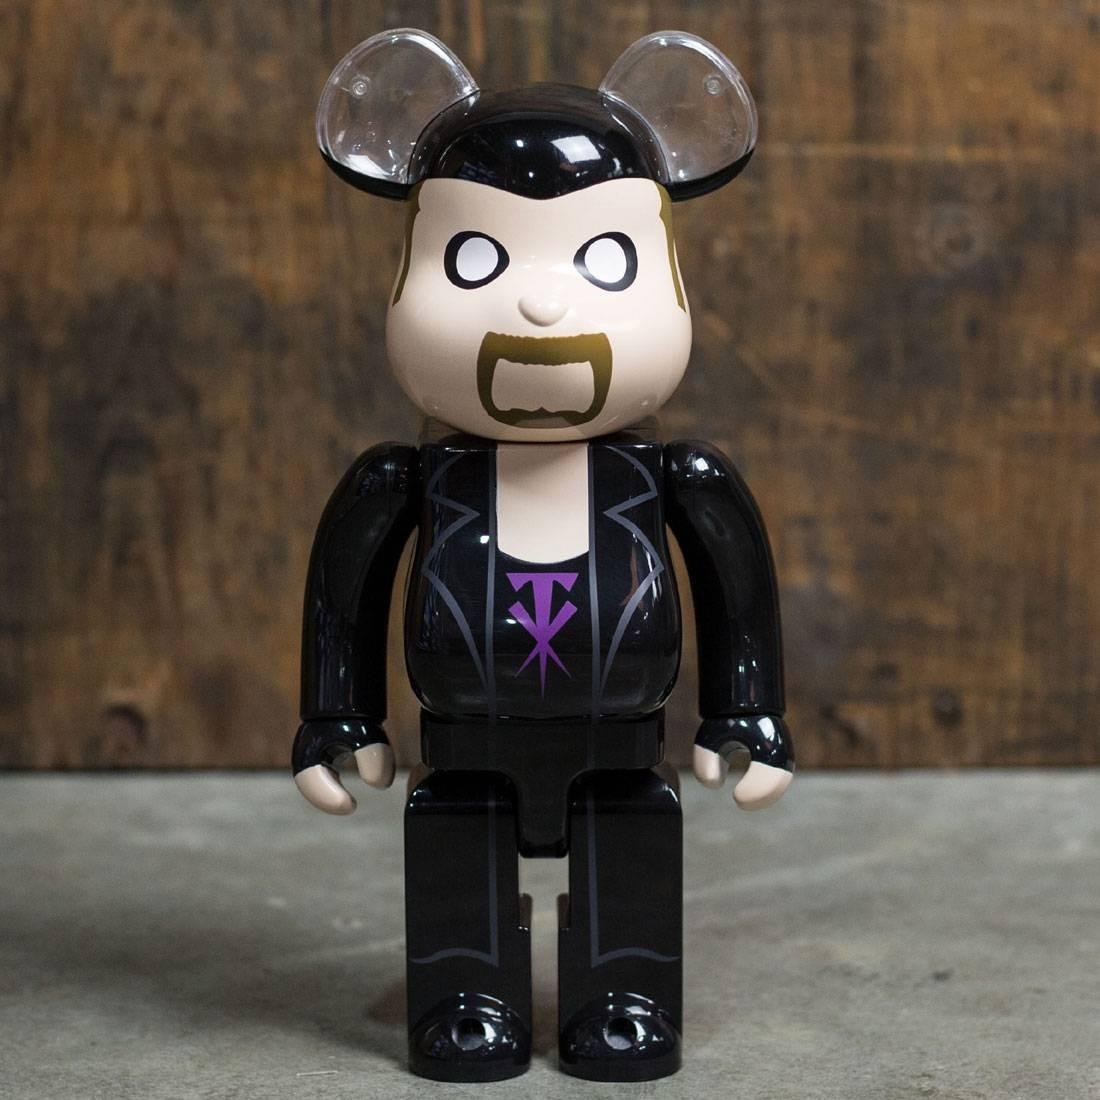 Medicom The Undertaker 400% Bearbrick Figure (black)